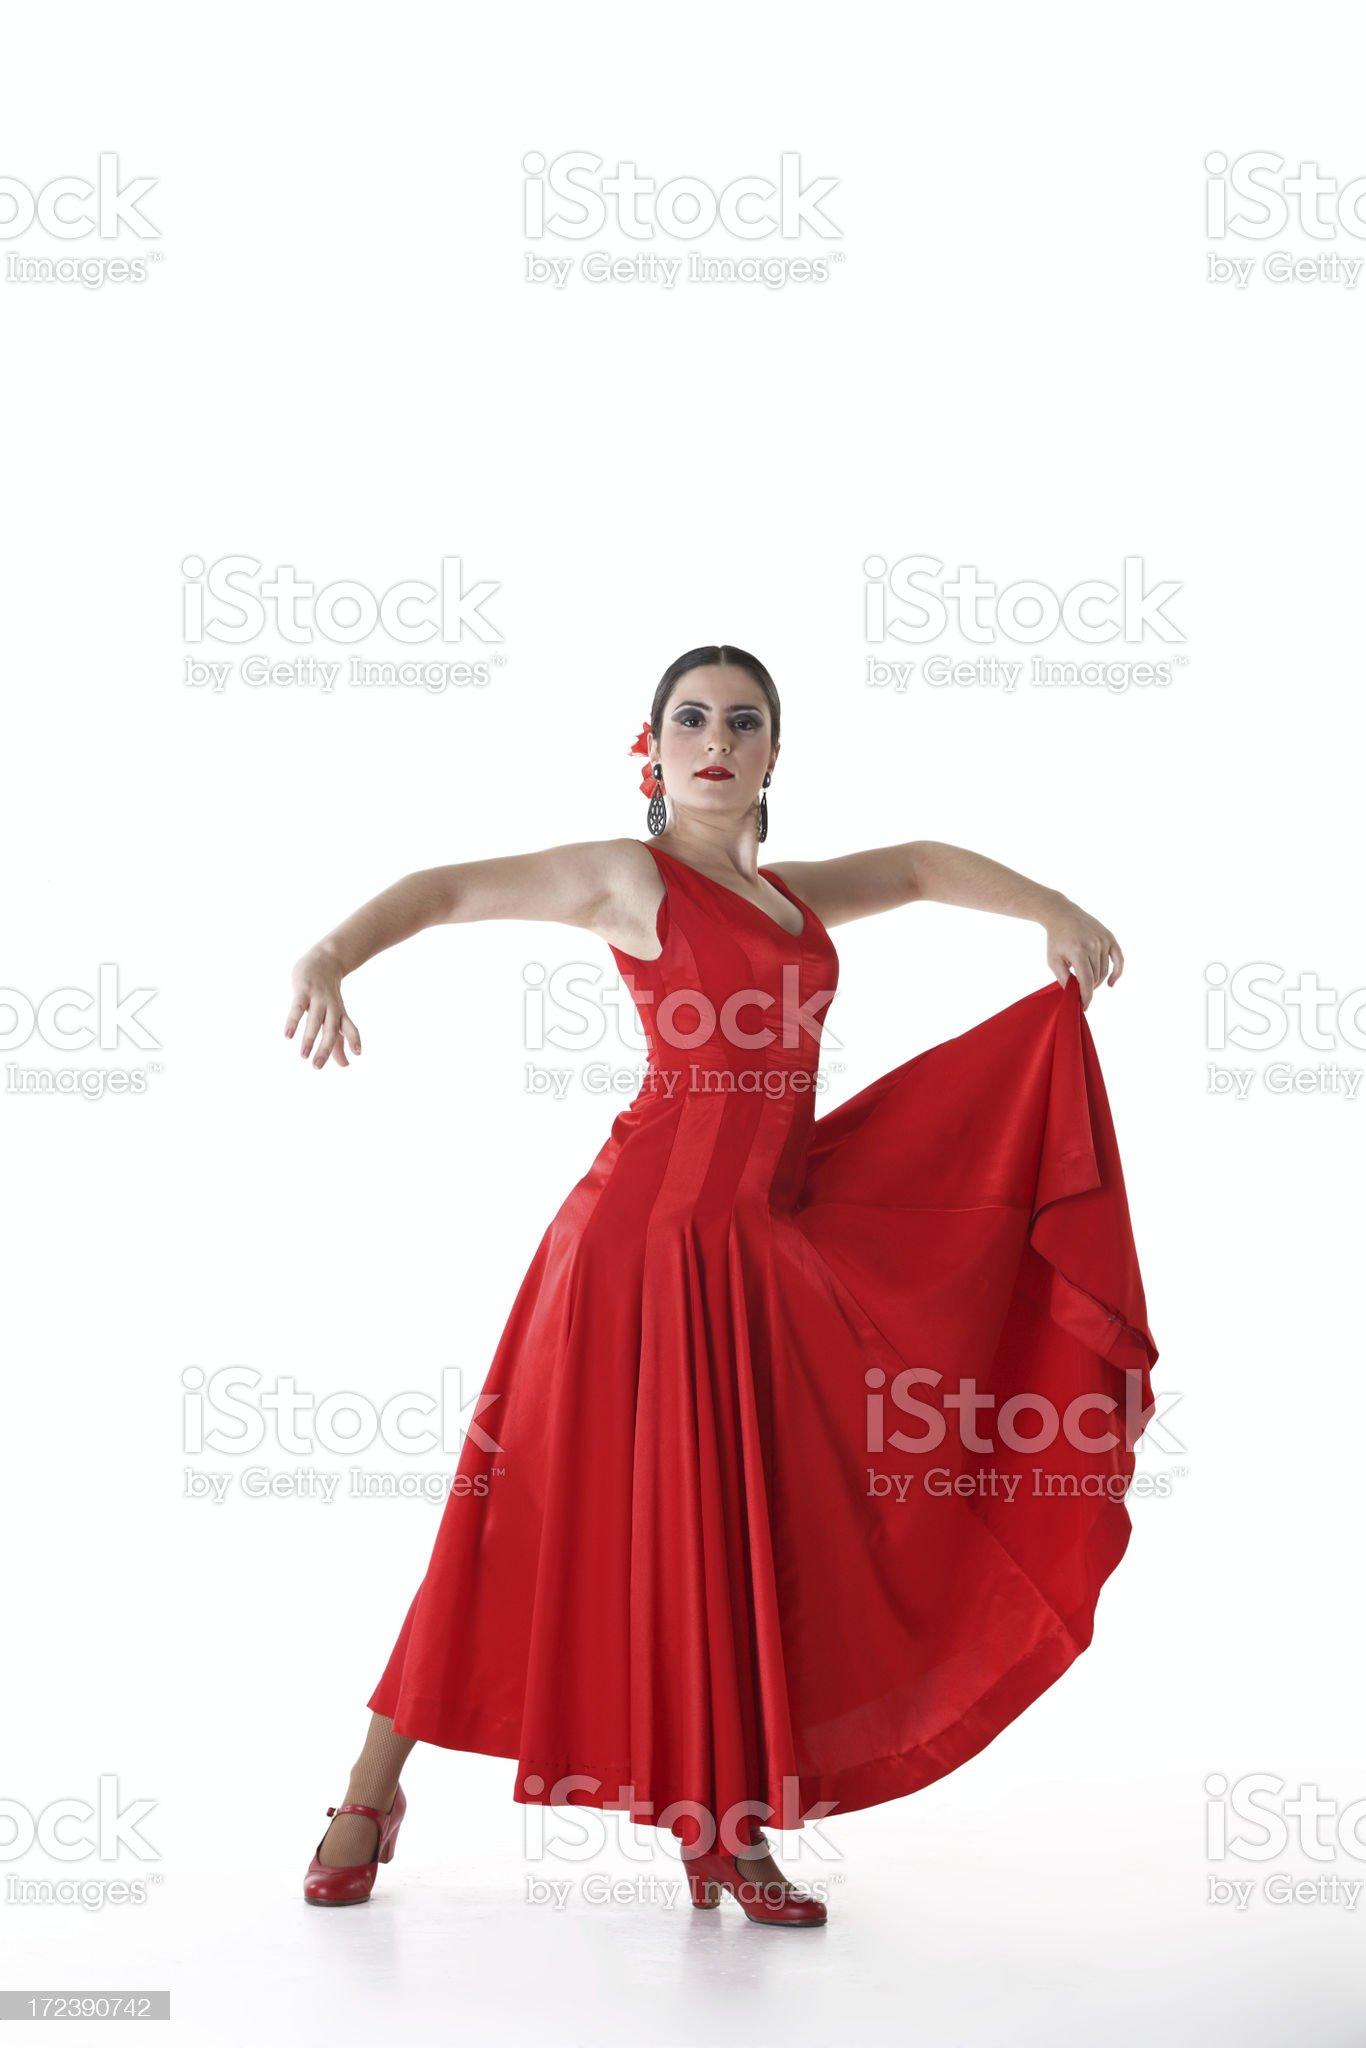 Flamenco woman royalty-free stock photo